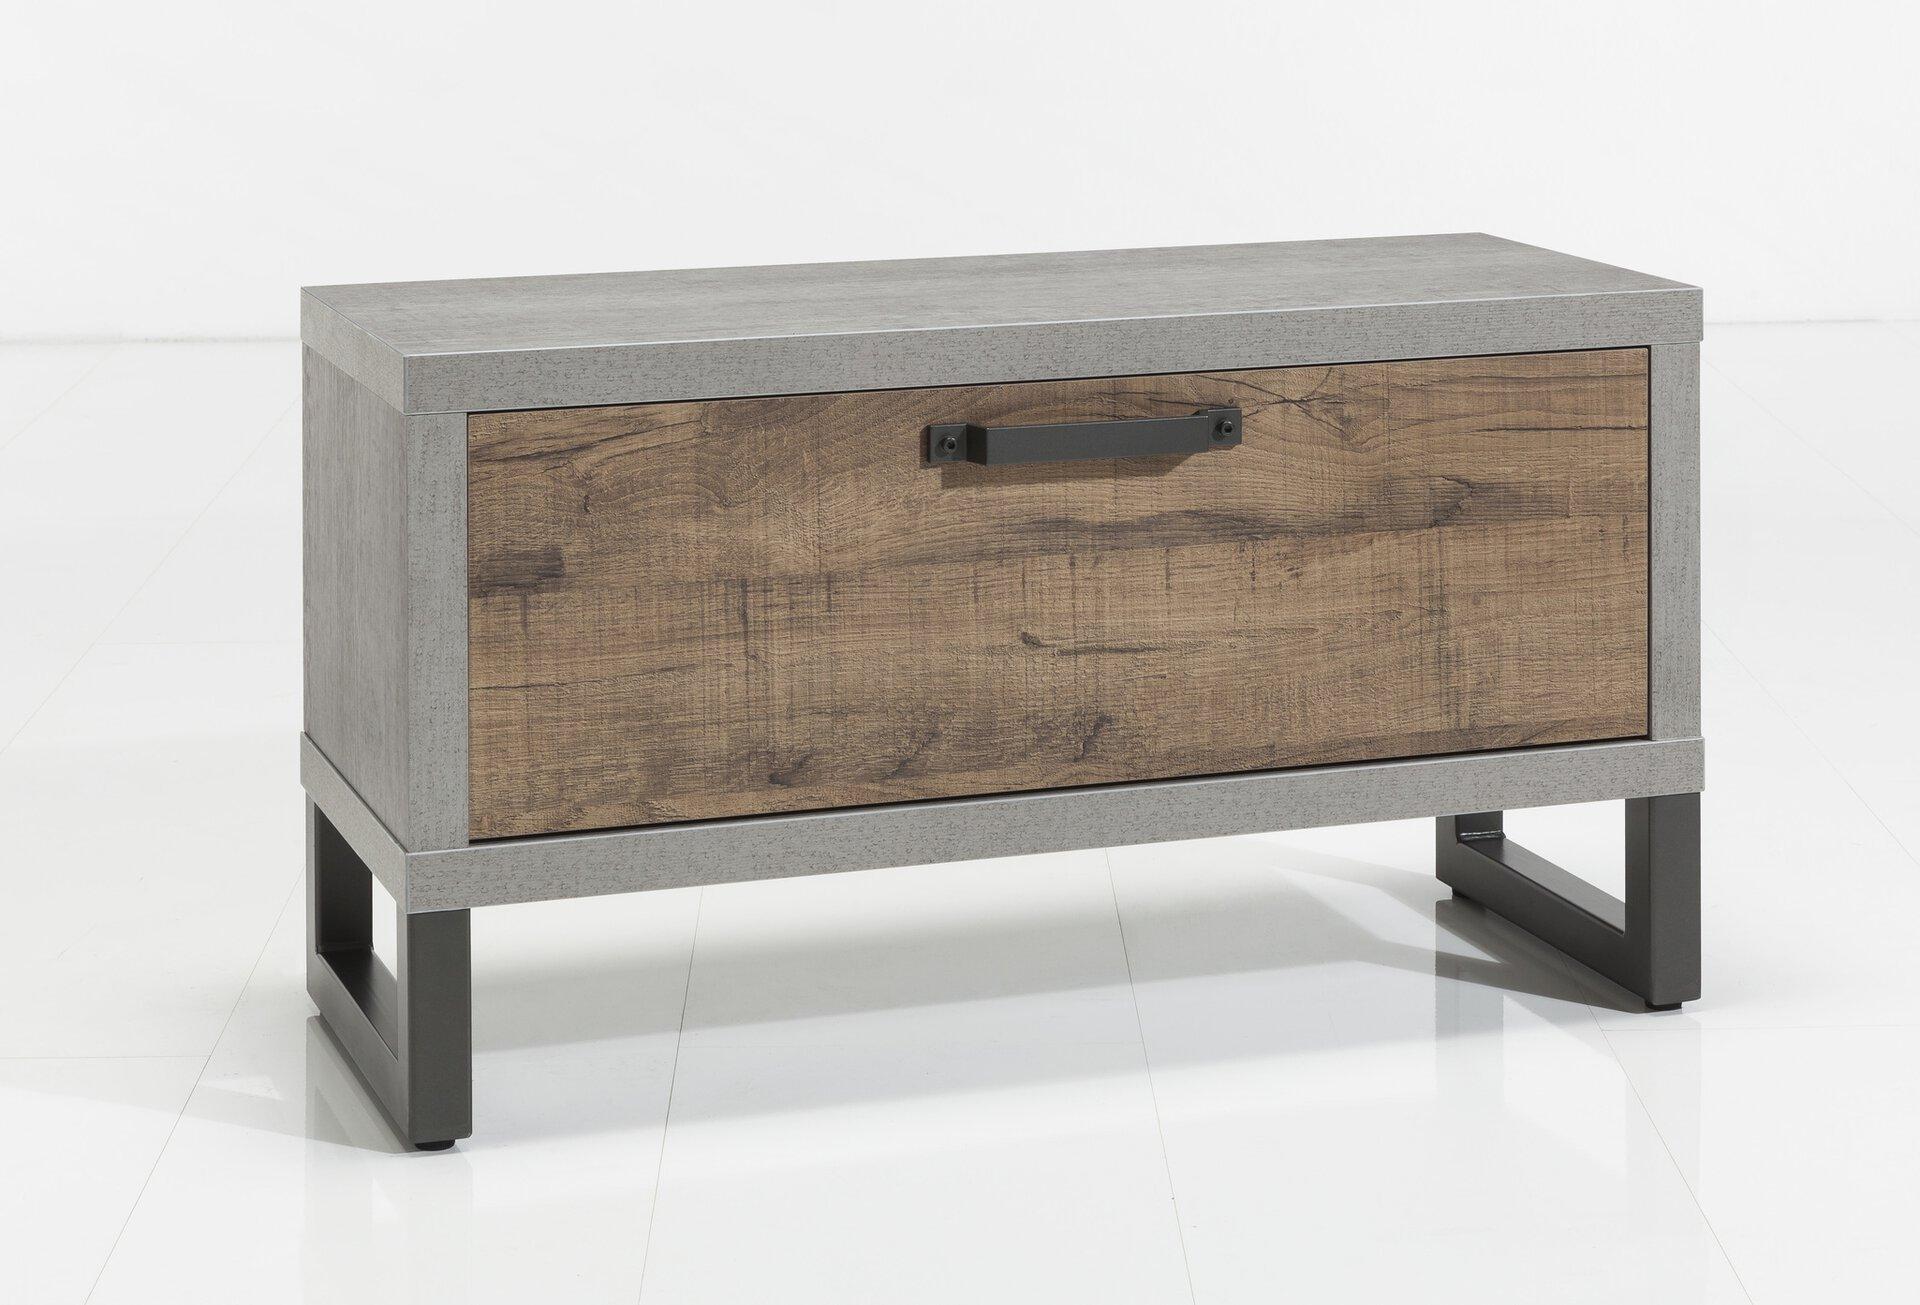 Garderobenbank LAFABRICA inDoor Holzwerkstoff 1 x 1 cm